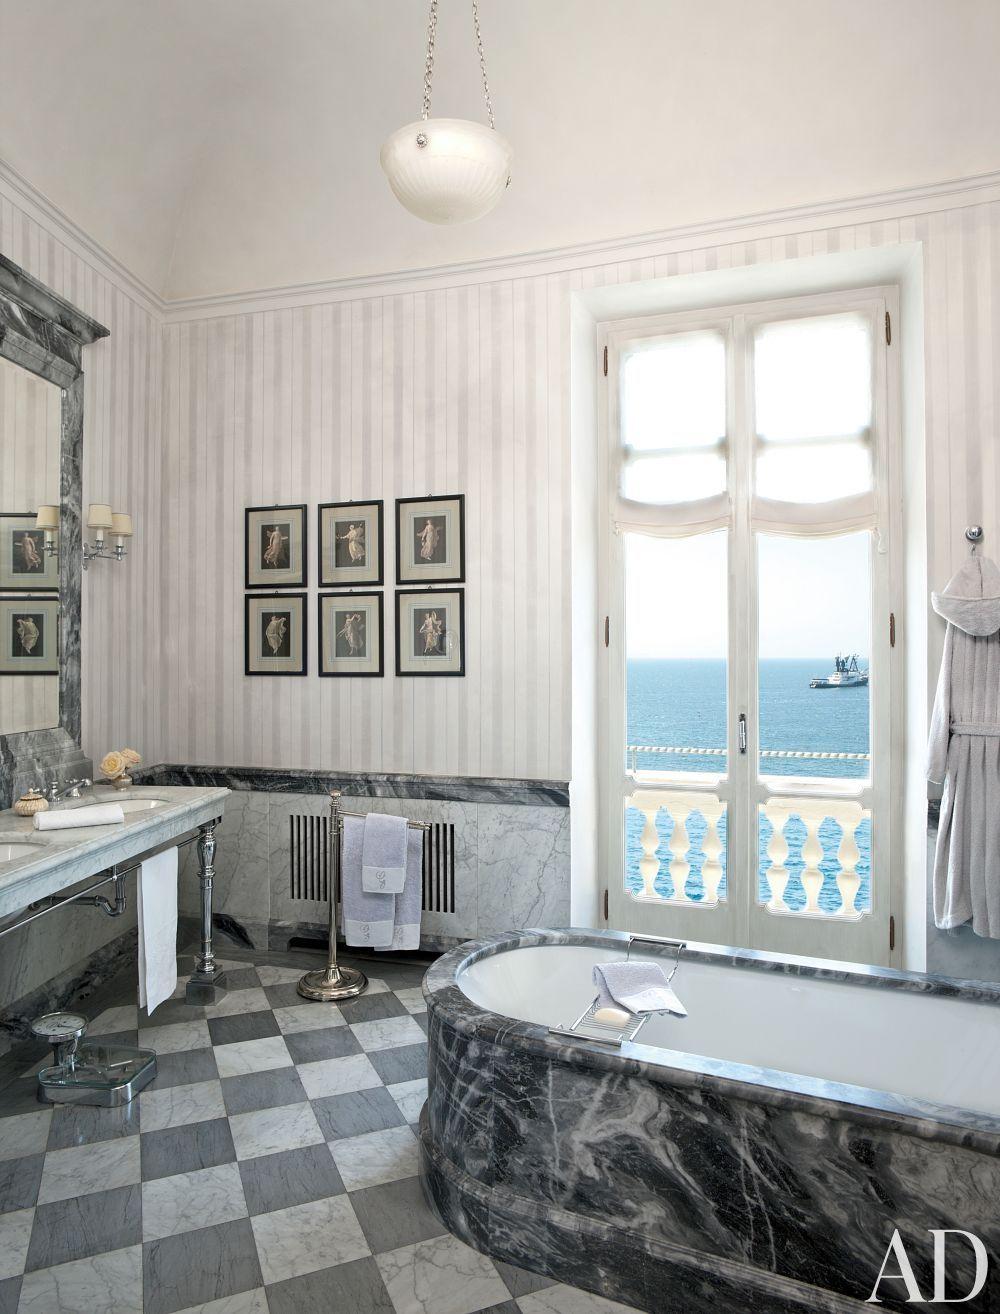 Traditional Bathroom By Studio Peregalli In Naples Italy